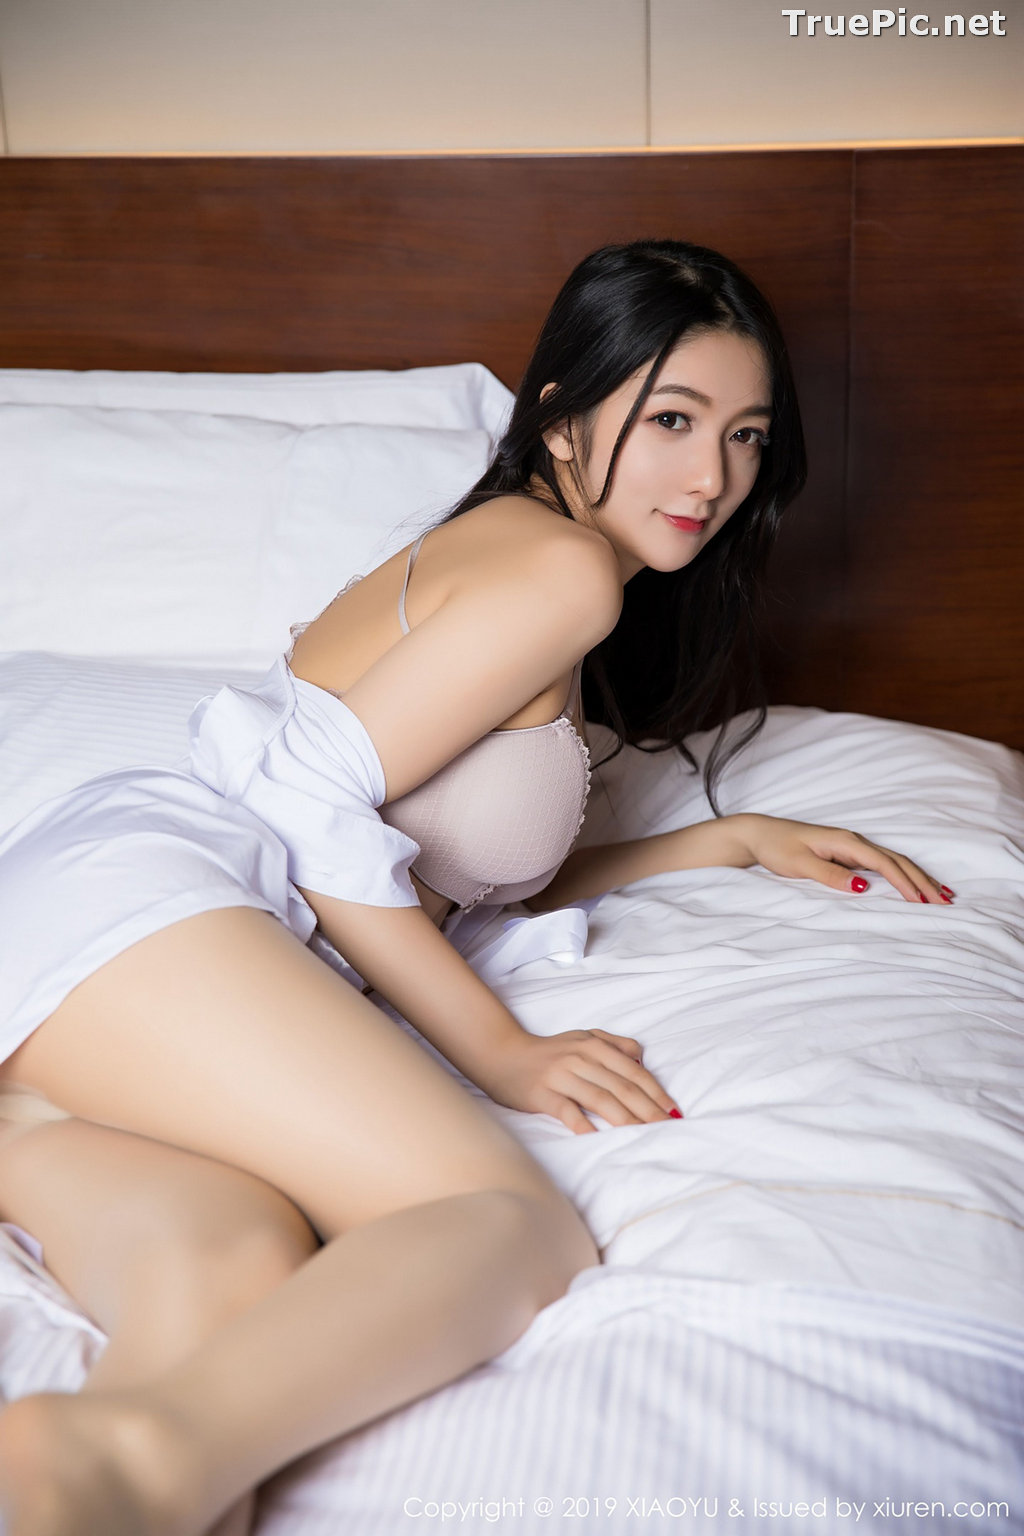 Image XiaoYu No.004 - Chinese Model - Xiao Reba (Angela喜欢猫) - White Sexy Nurse - TruePic.net - Picture-59